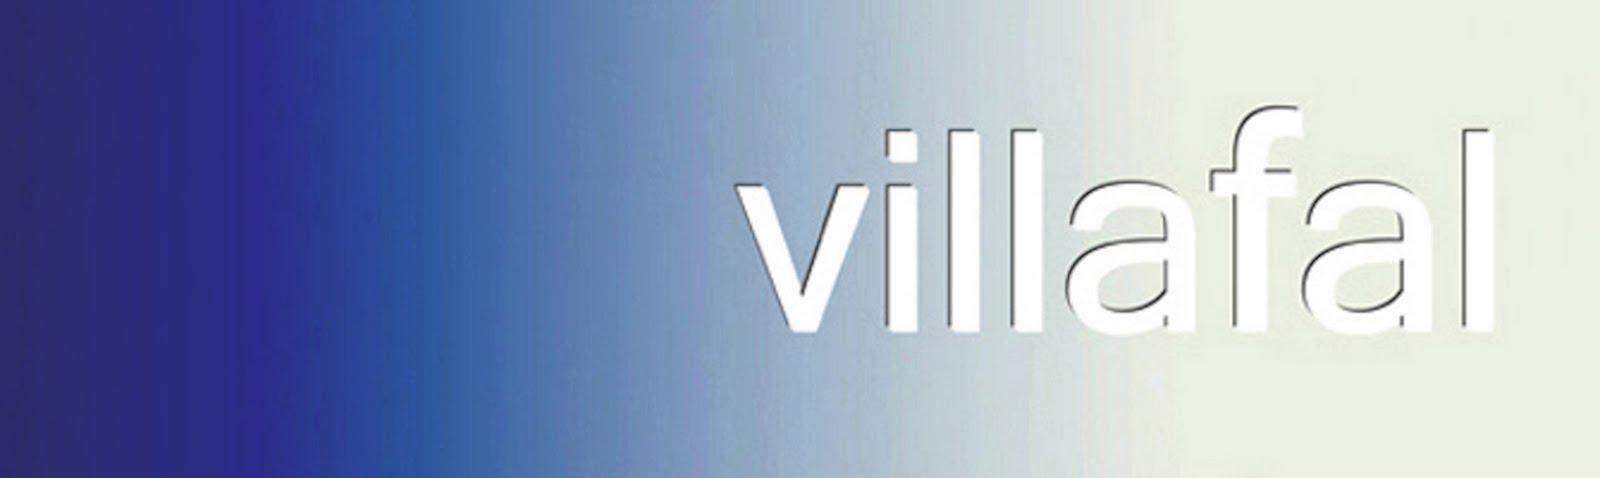 VILLAFAL